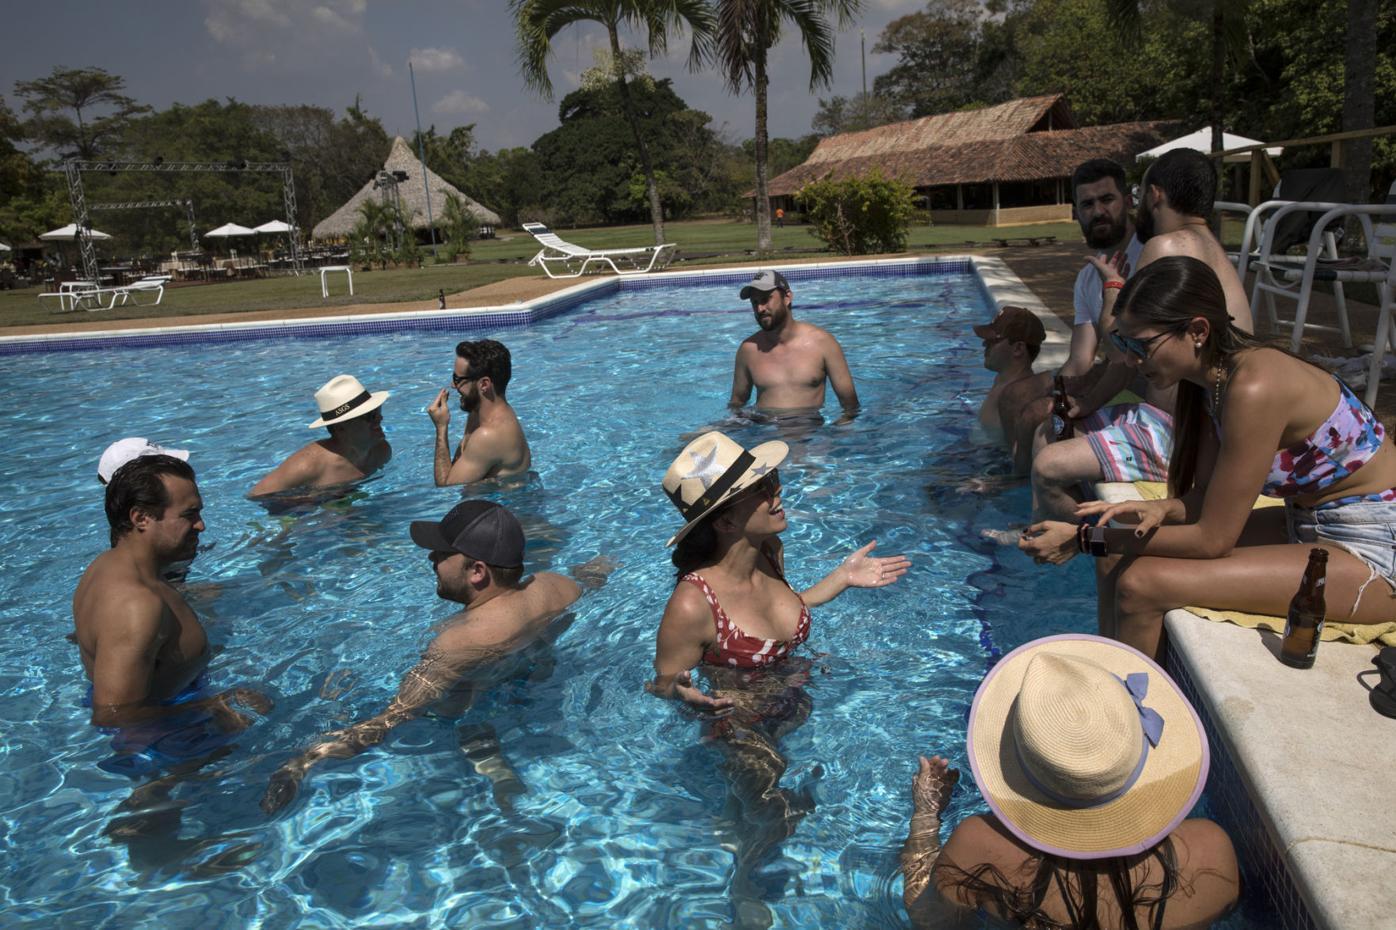 Venezuela Wedding Amid Crisis